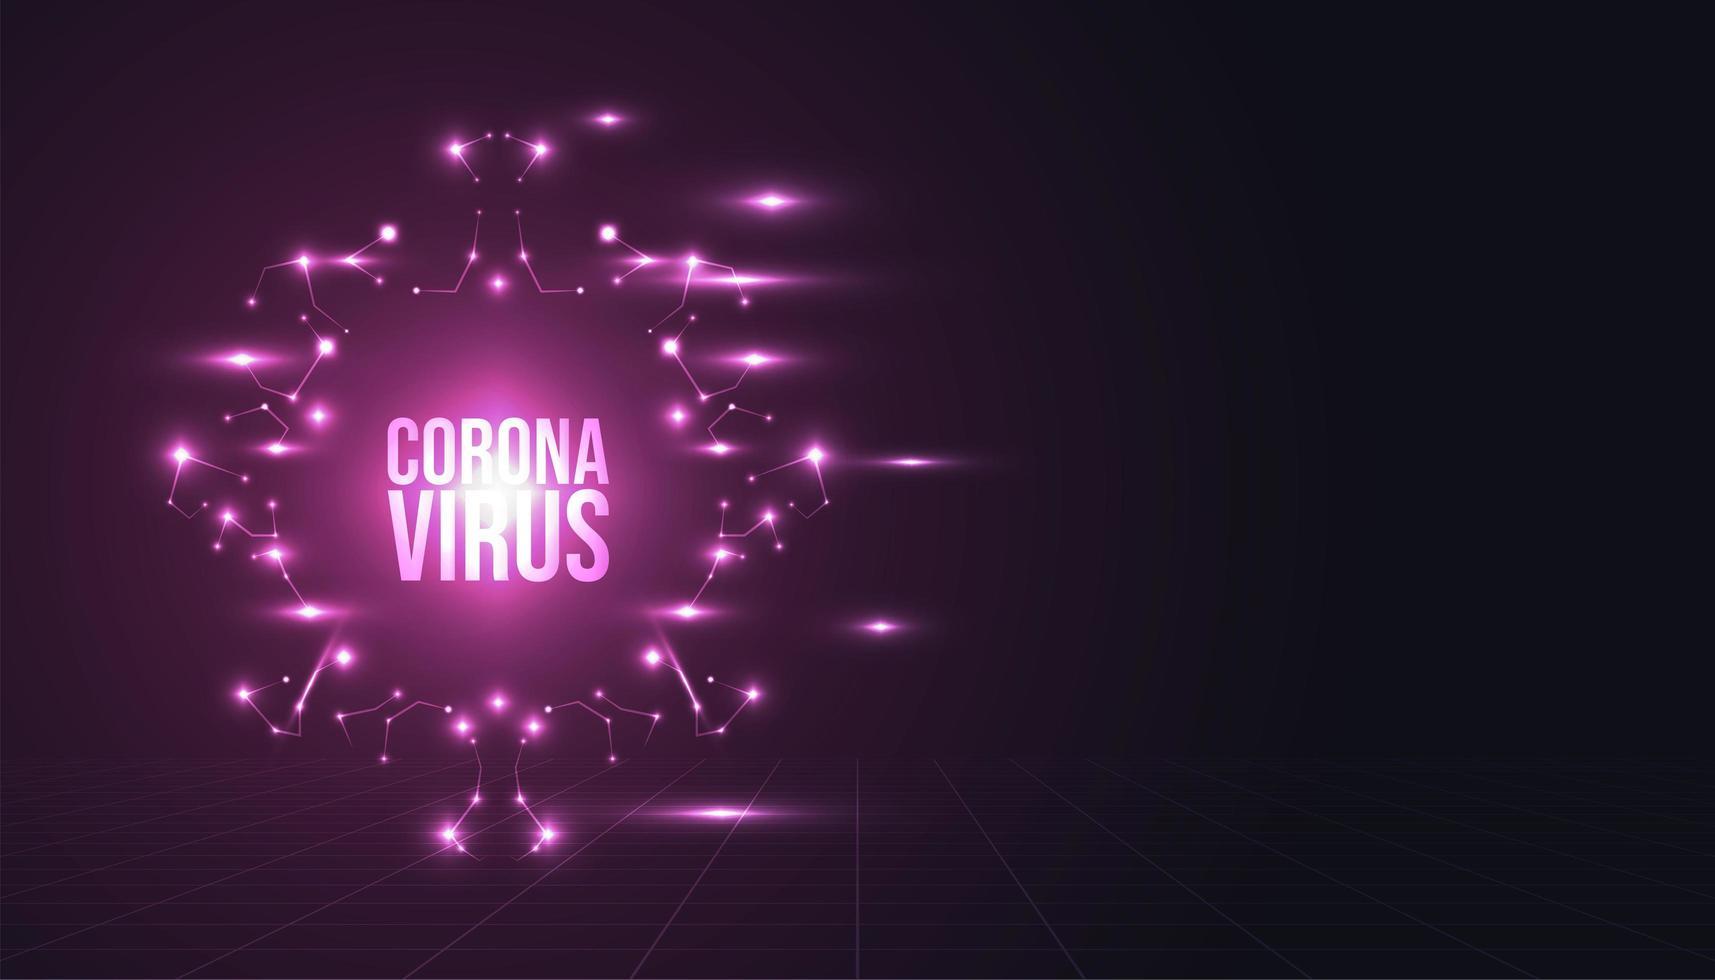 Fondo de coronavirus brillante vector